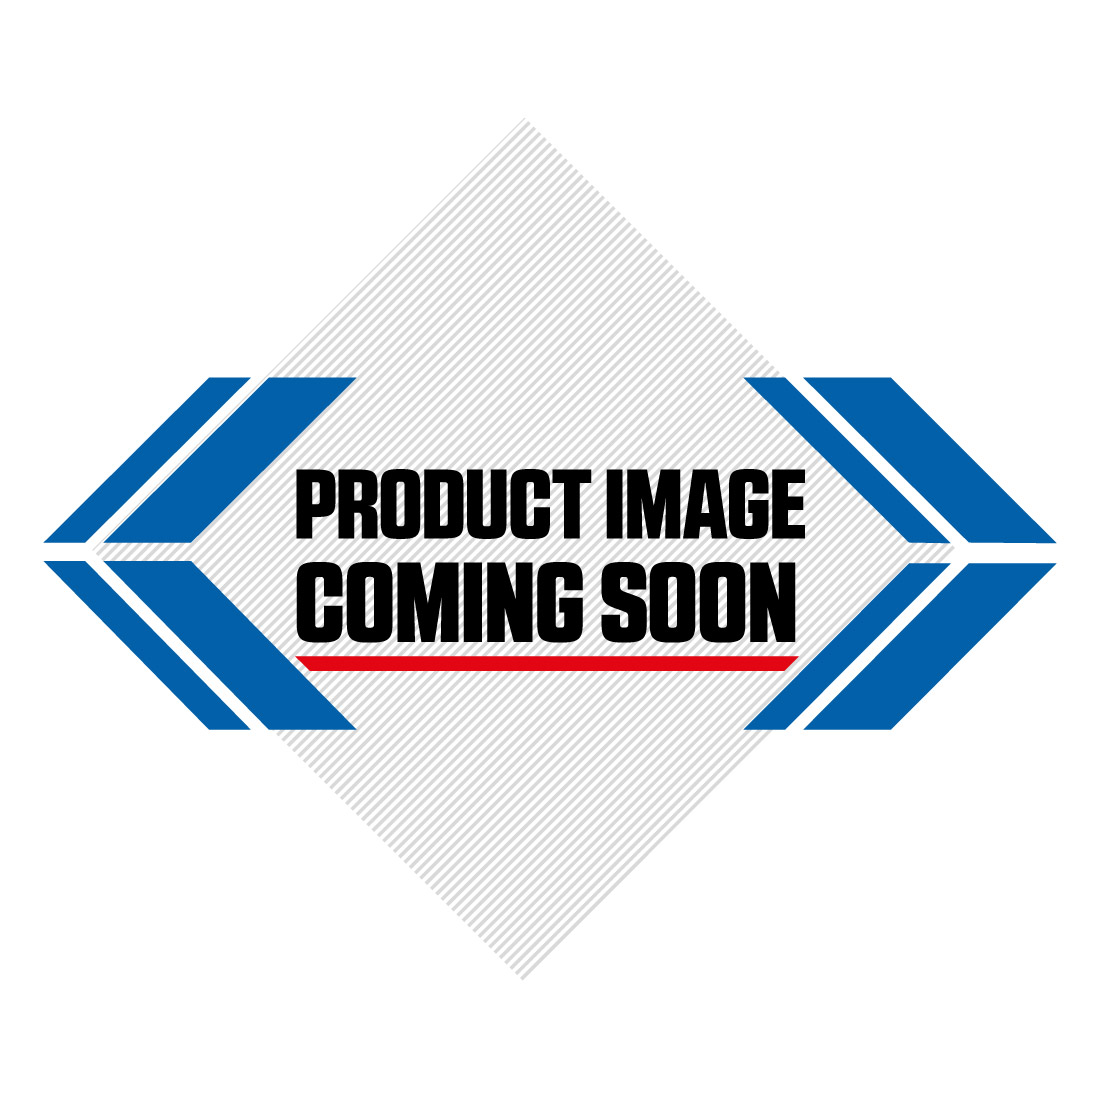 Kawasaki Restyled Plastic Kit KX 85 (01-09) (11-12) OEM Factory Image-3>